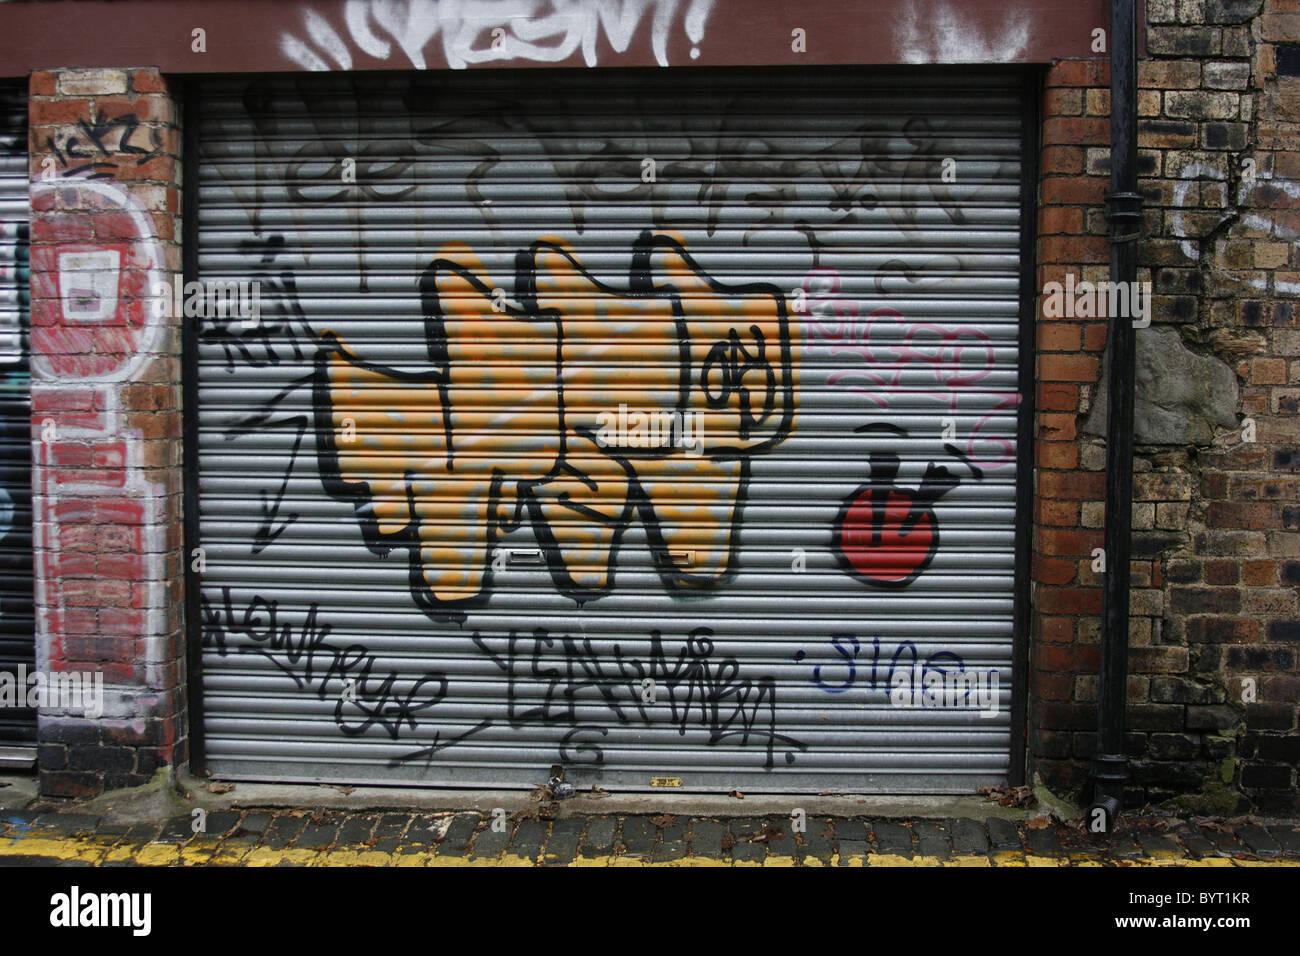 Graffiti On Garage Door Stock Photo Royalty Free Image